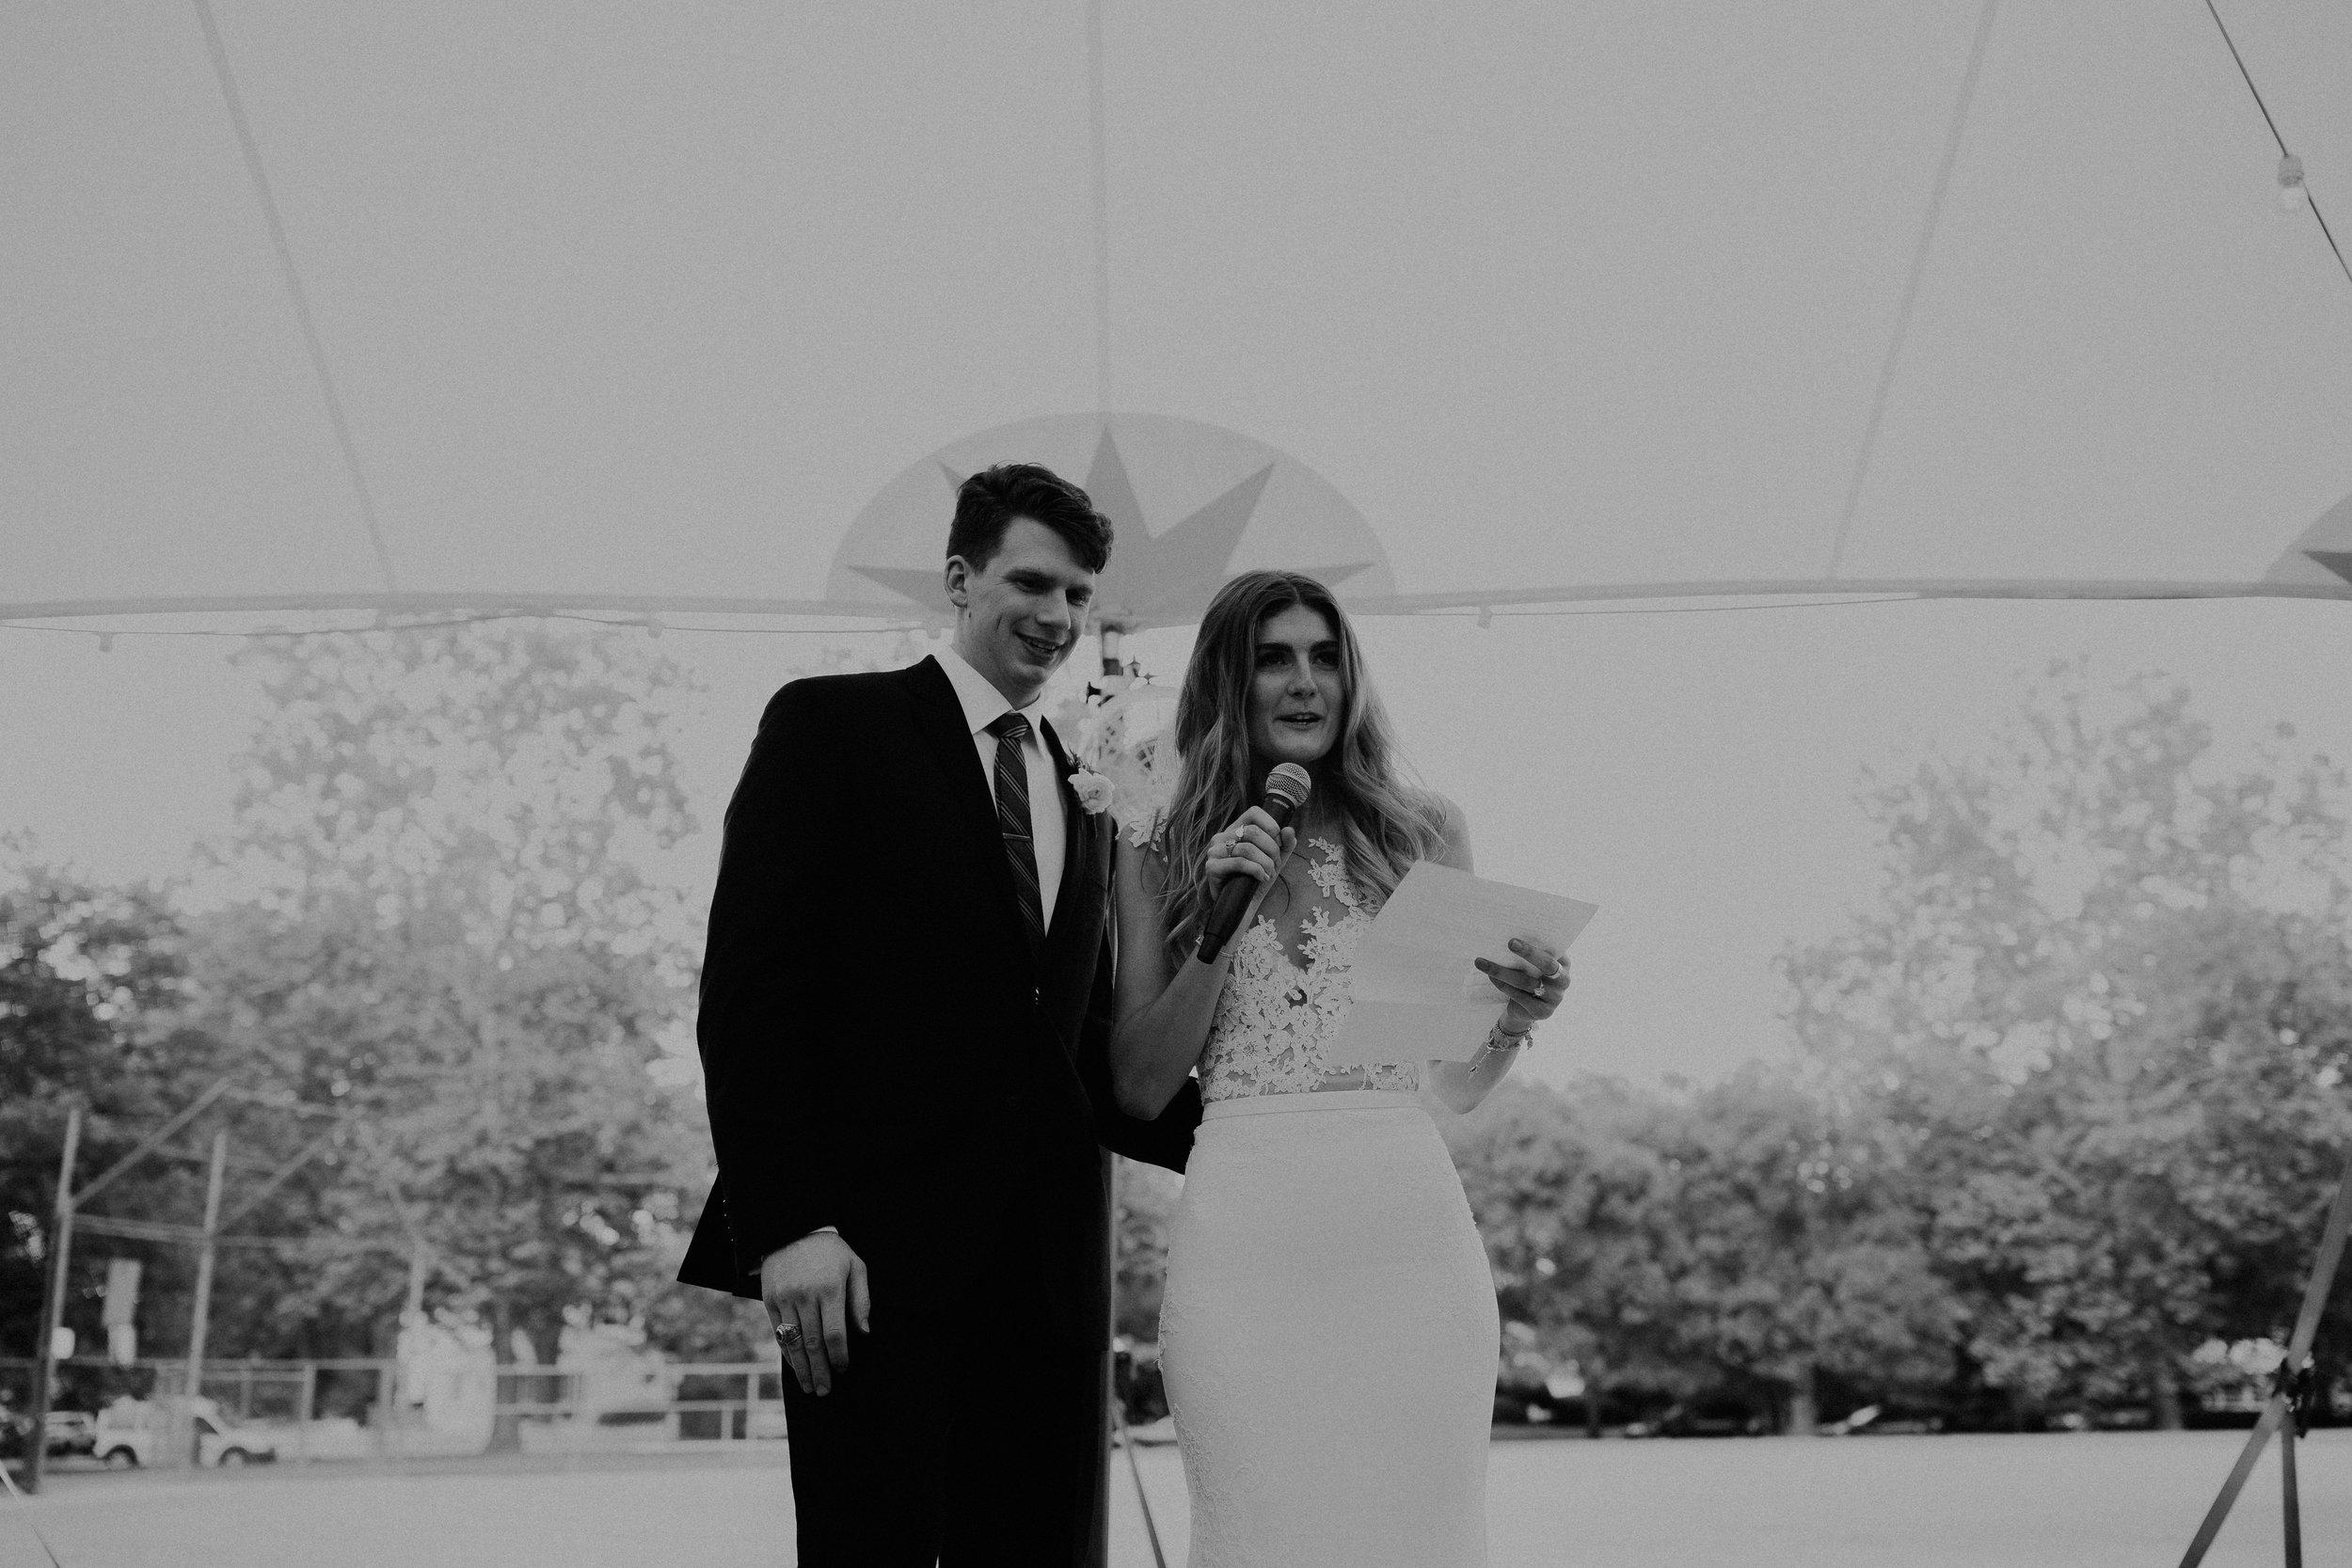 Mariemont_Chapel_Cincinnati_Wedding_Hannah_Nick-EDIT-604.JPG